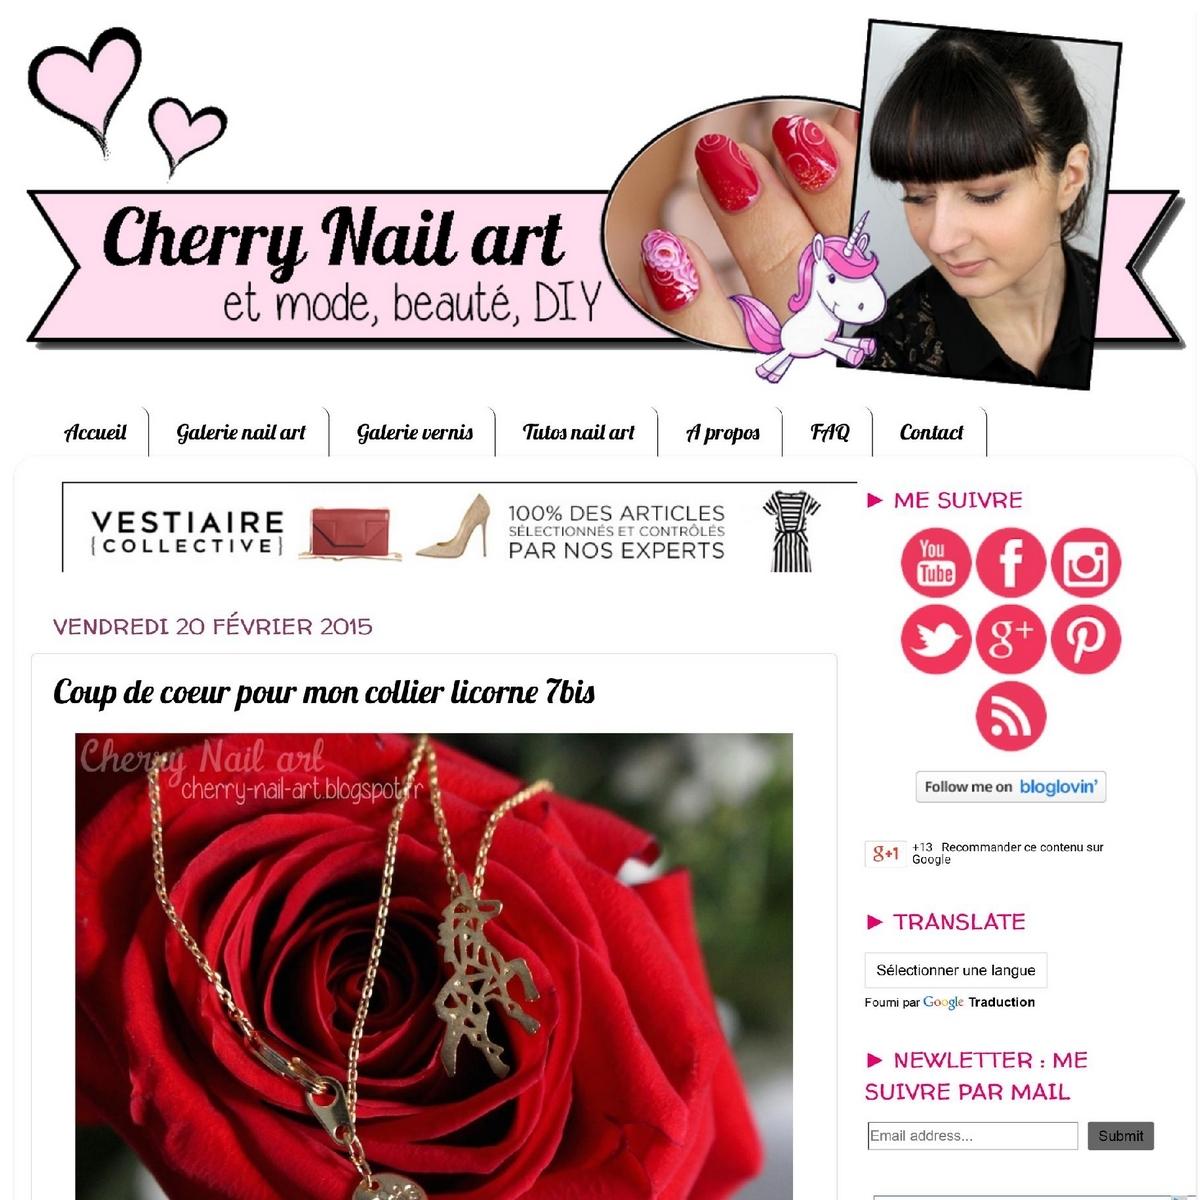 Bijoux 7bis Paris - Cherry Nail art